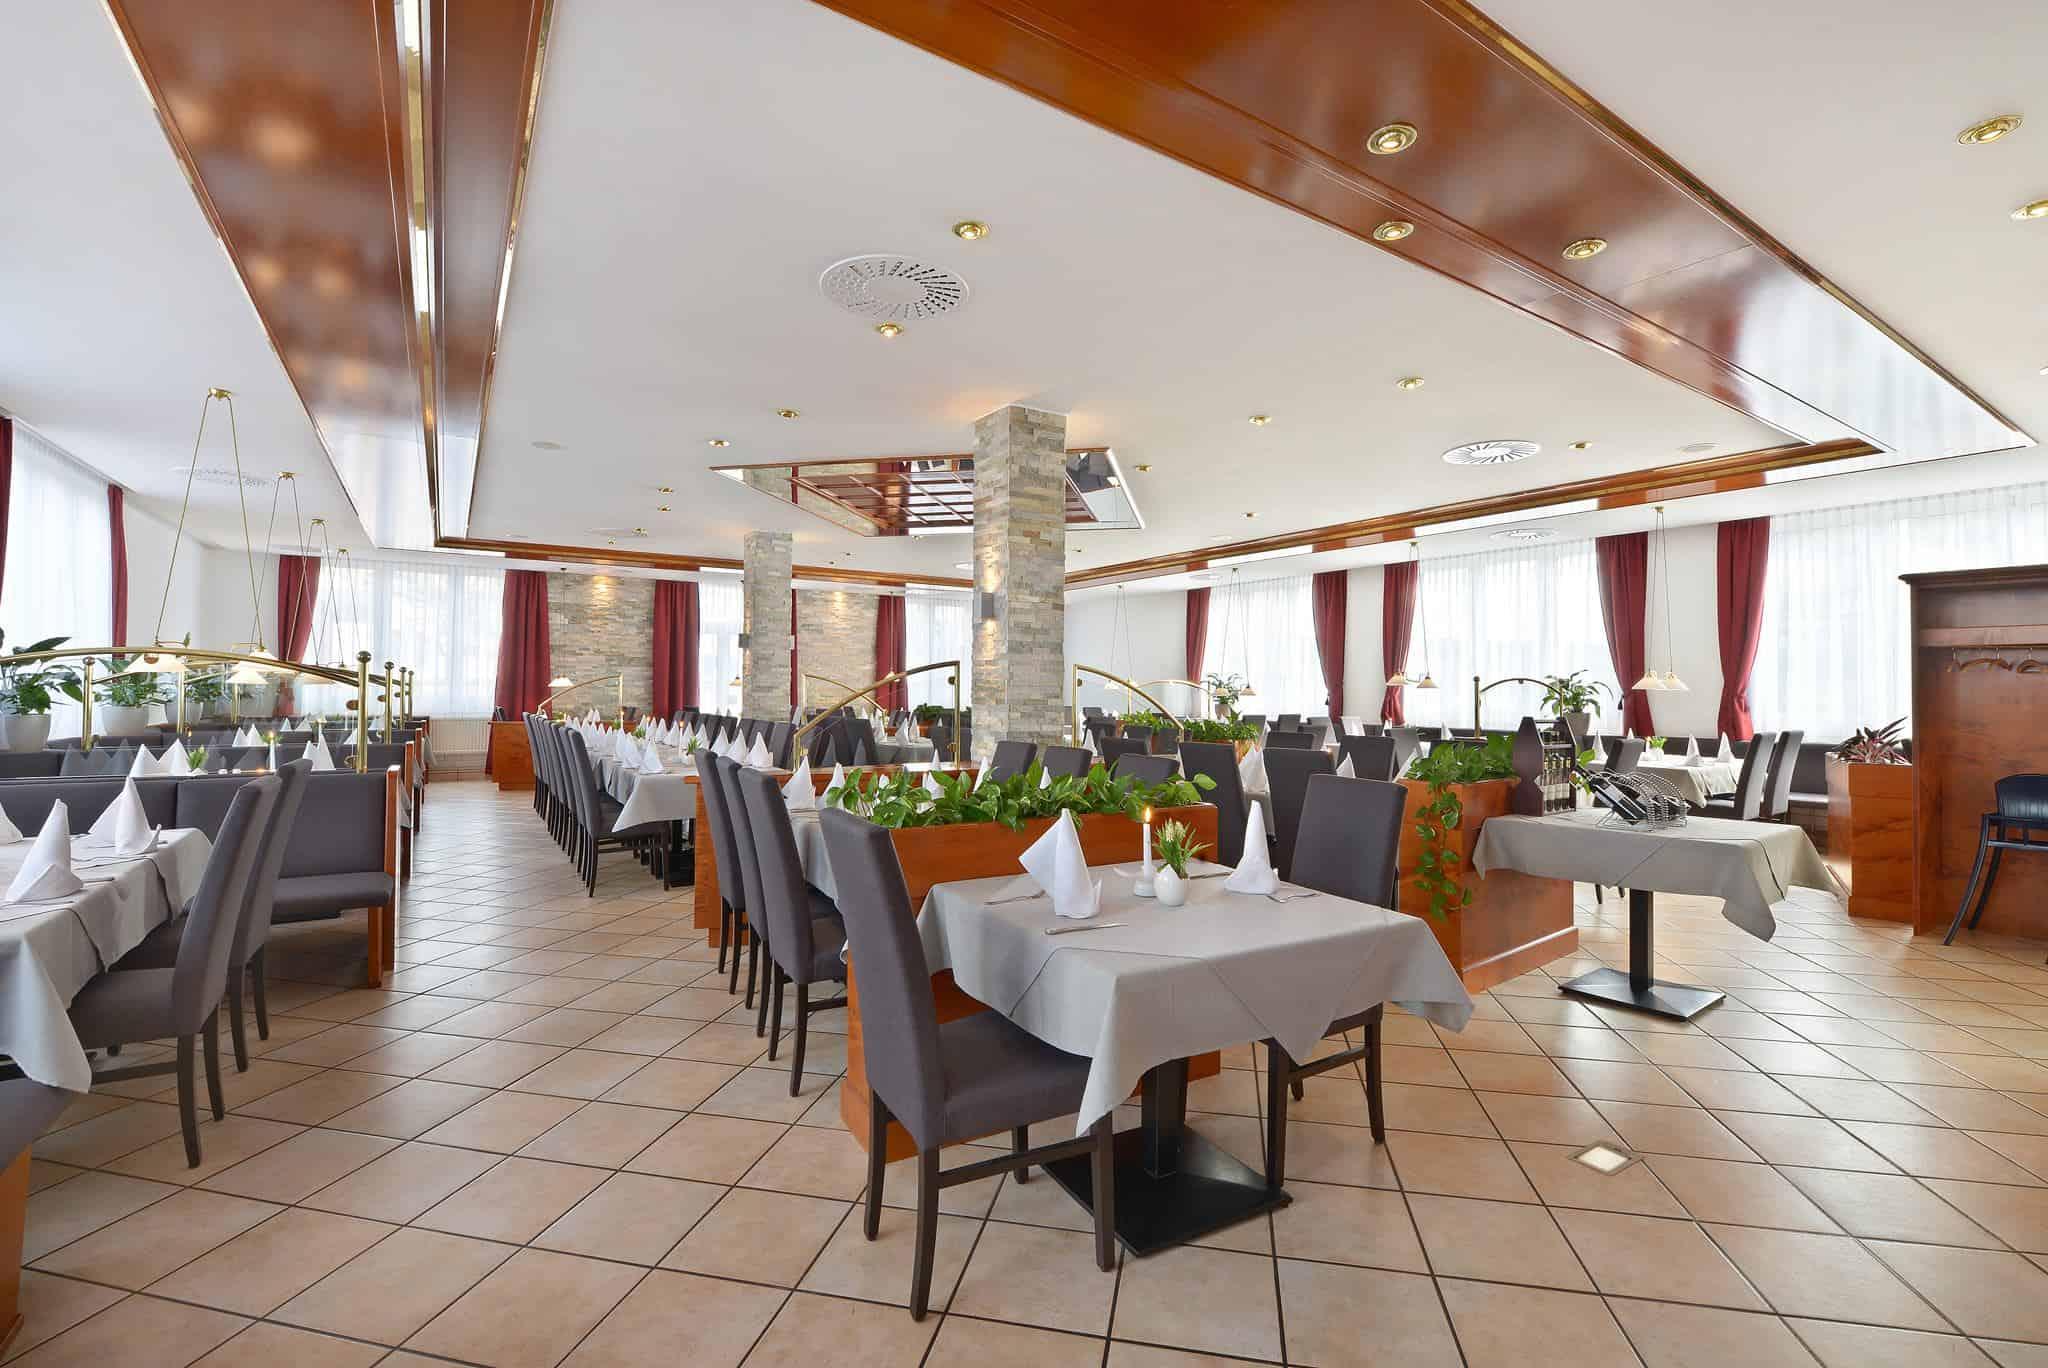 Restoran – Bei Onkel Ivo